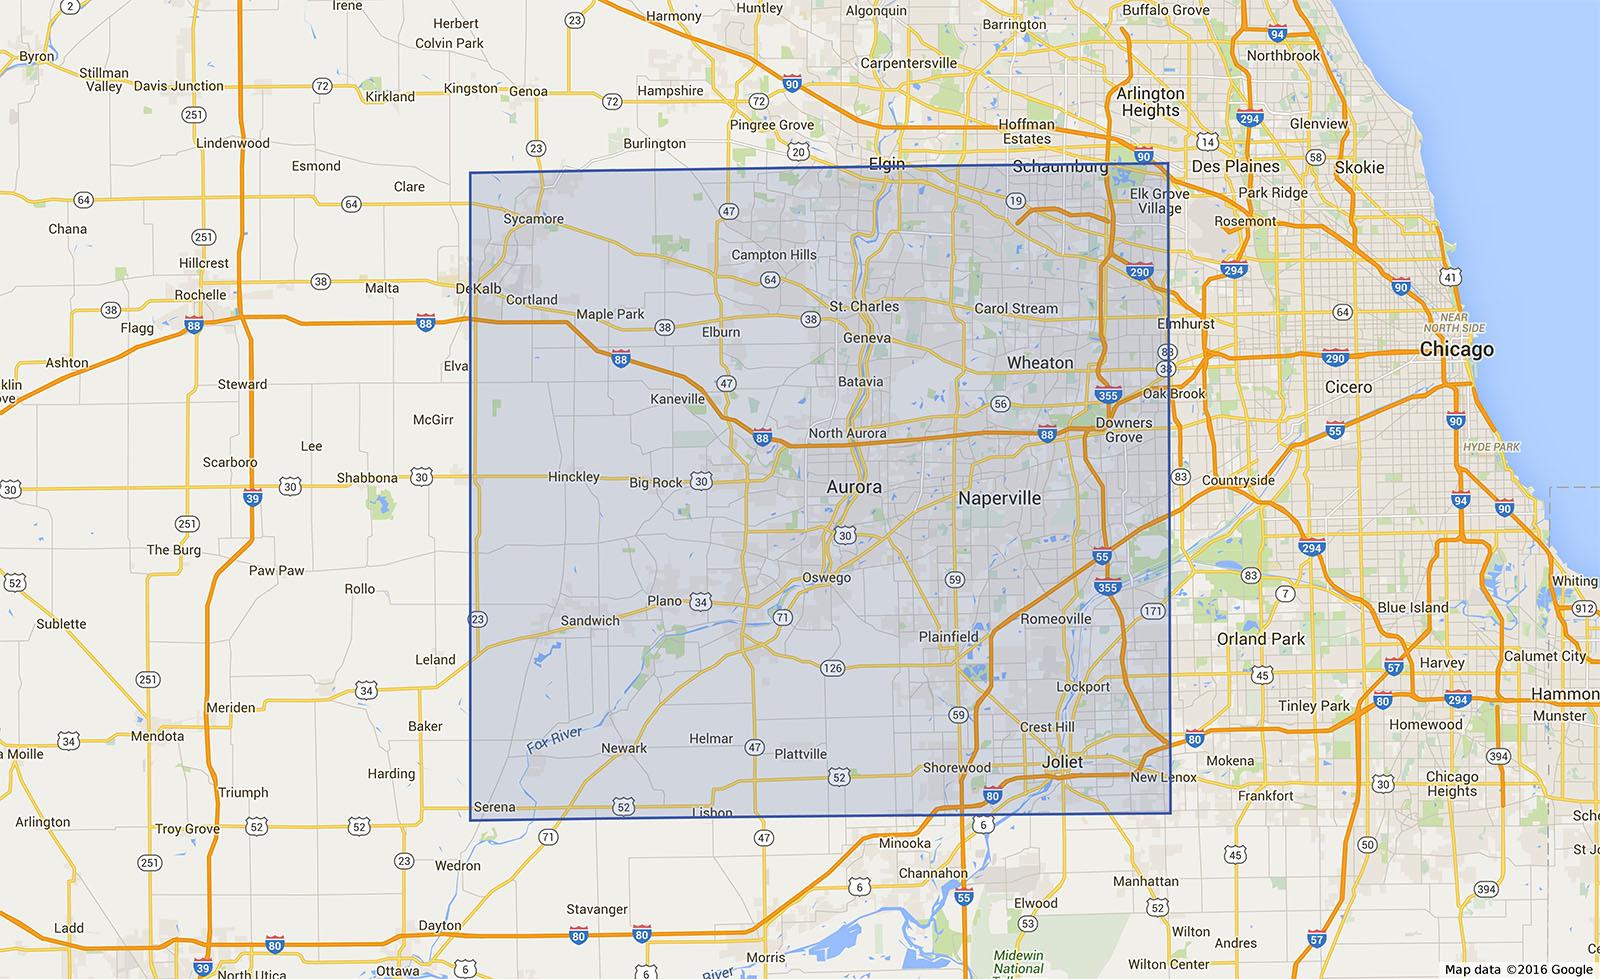 chicago land suburbs